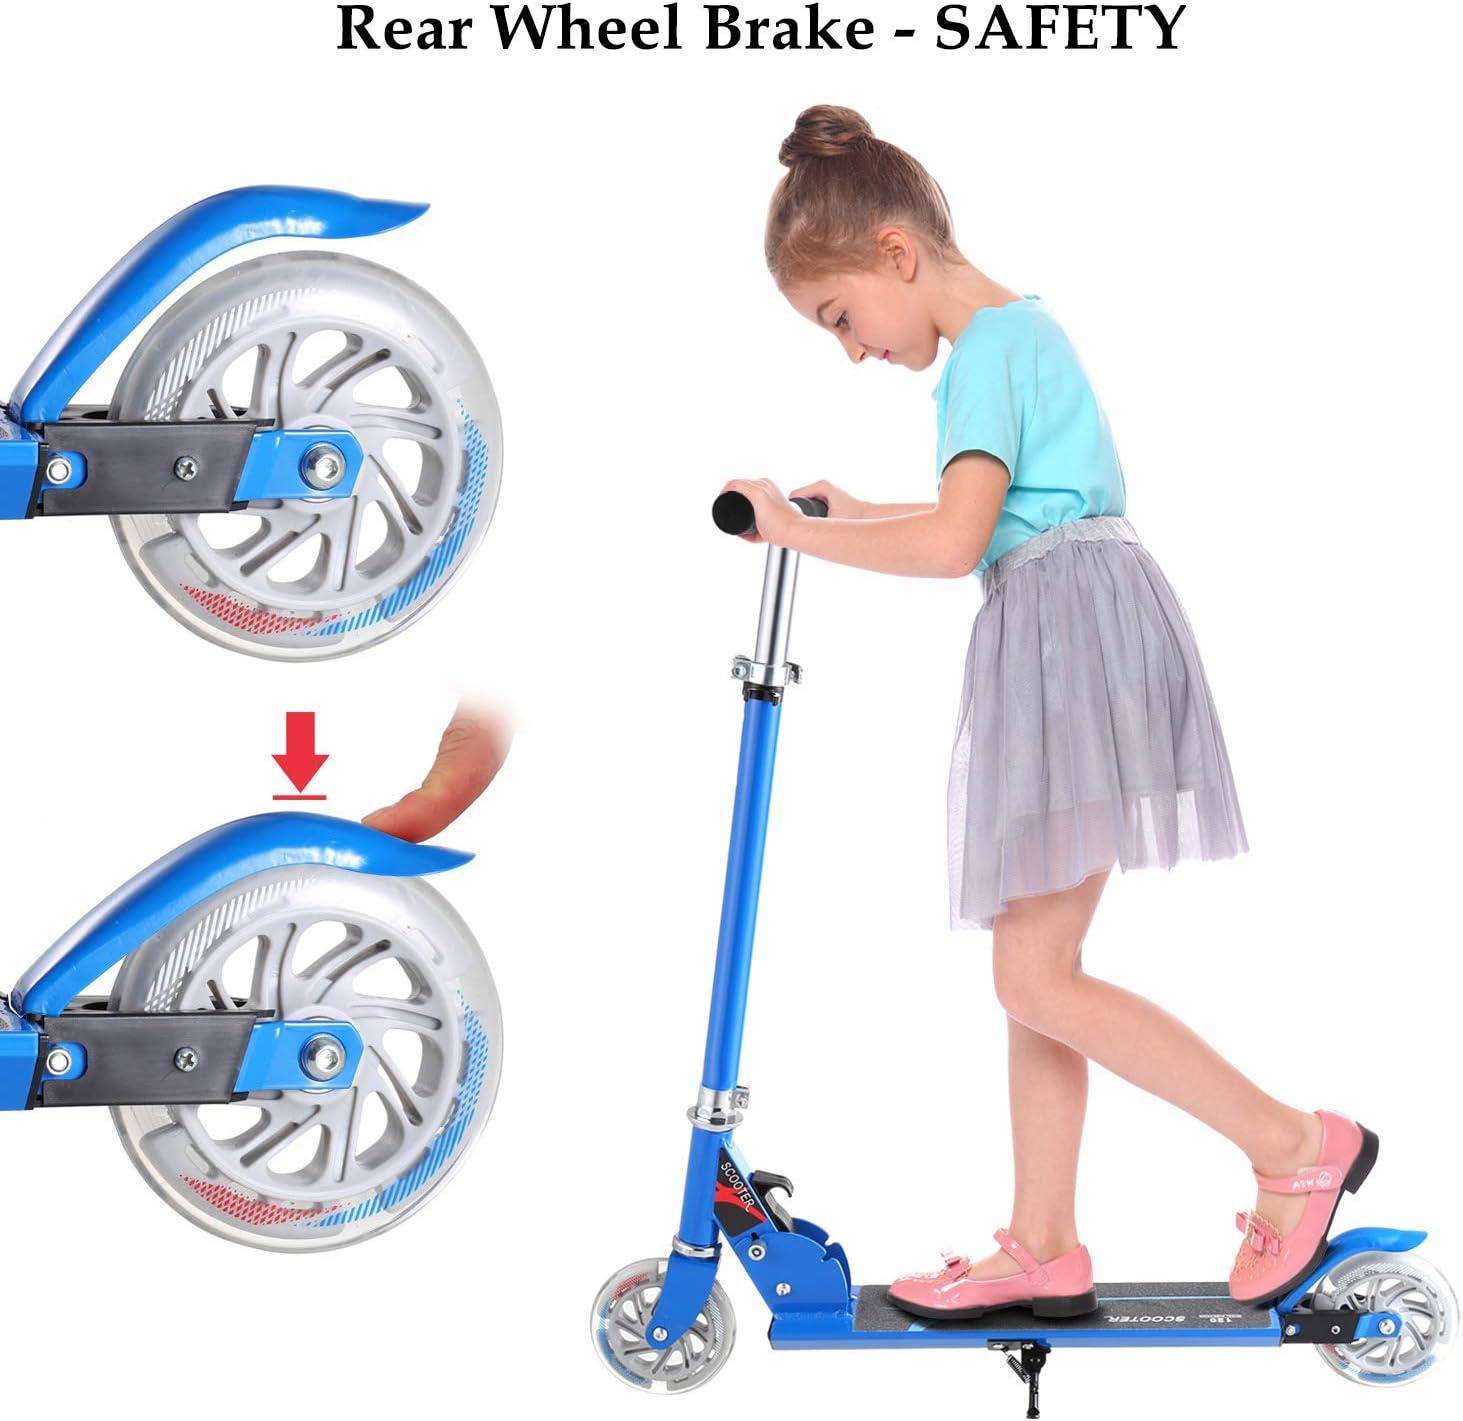 Amazon.com: Hikole Scooter para niños | Scooters Plegable ...